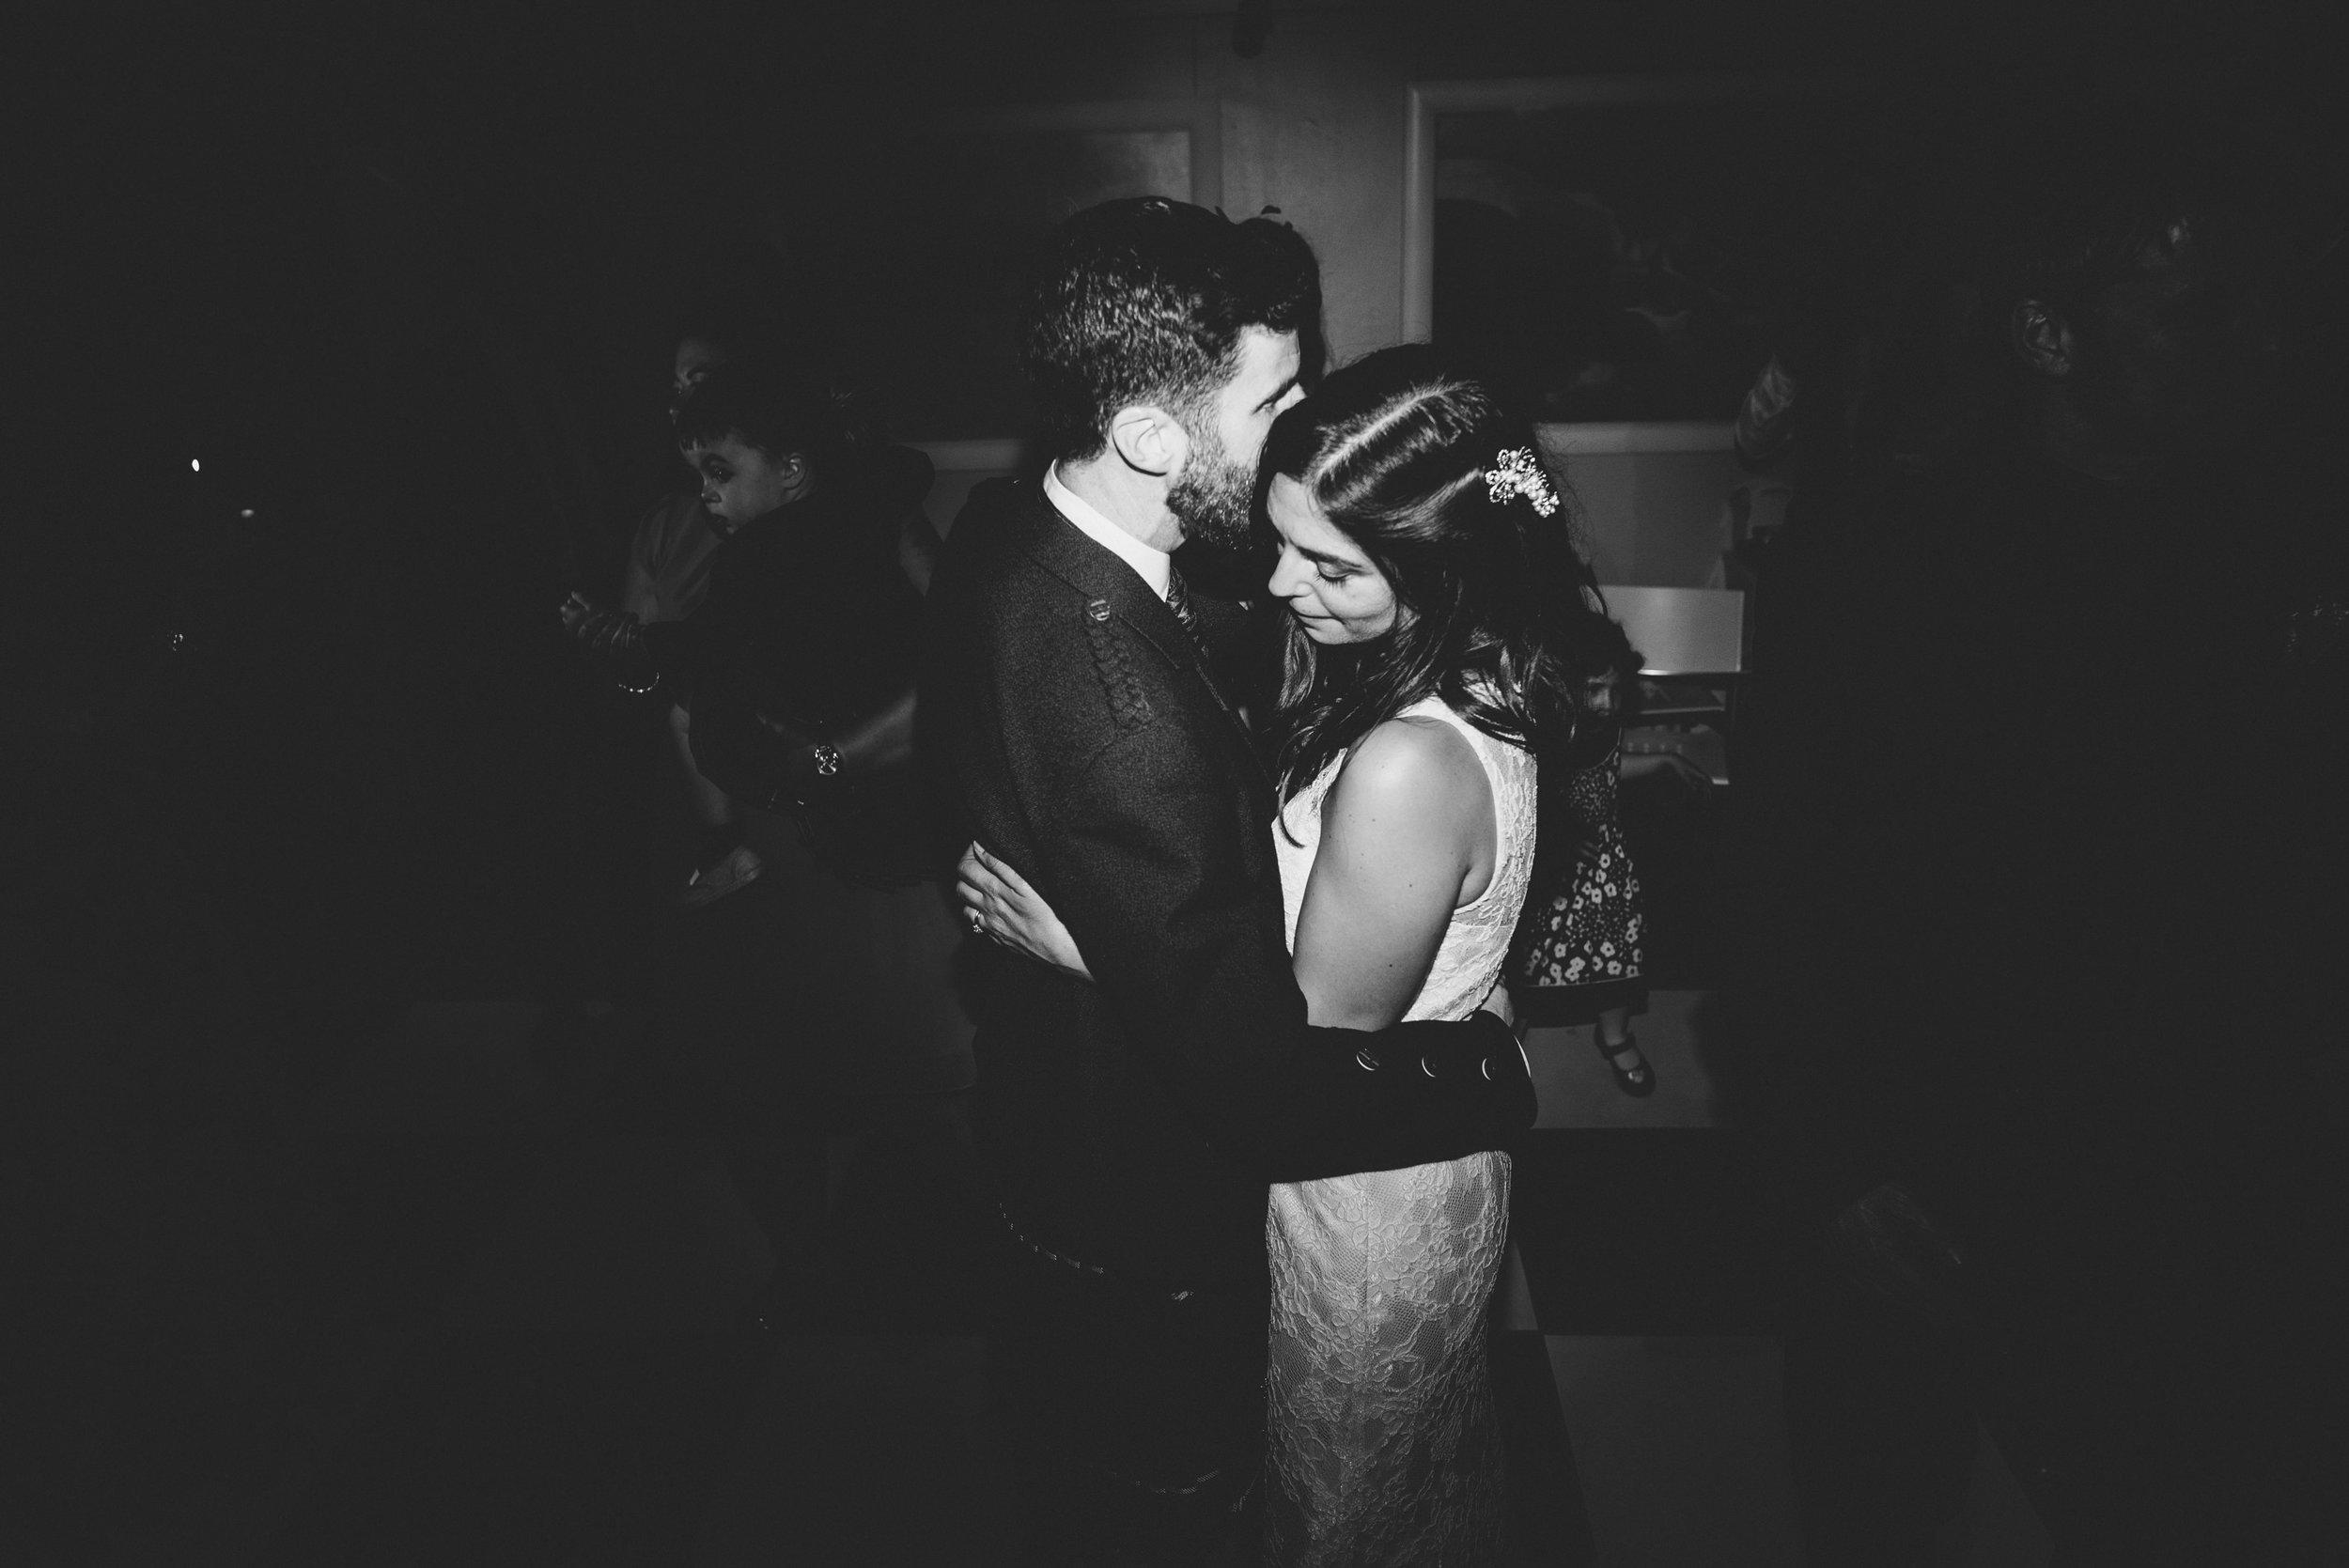 0026-LISA-DEVINE-PHOTOGRAPHY-ALTERNATIVE-WEDDING-PHOTOGRAPHY-SCOTLAND-DESTINATION-WEDDINGS-GLASGOW-WEDDINGS-COOL-WEDDINGS-STYLISH-WEDDINGS.JPG